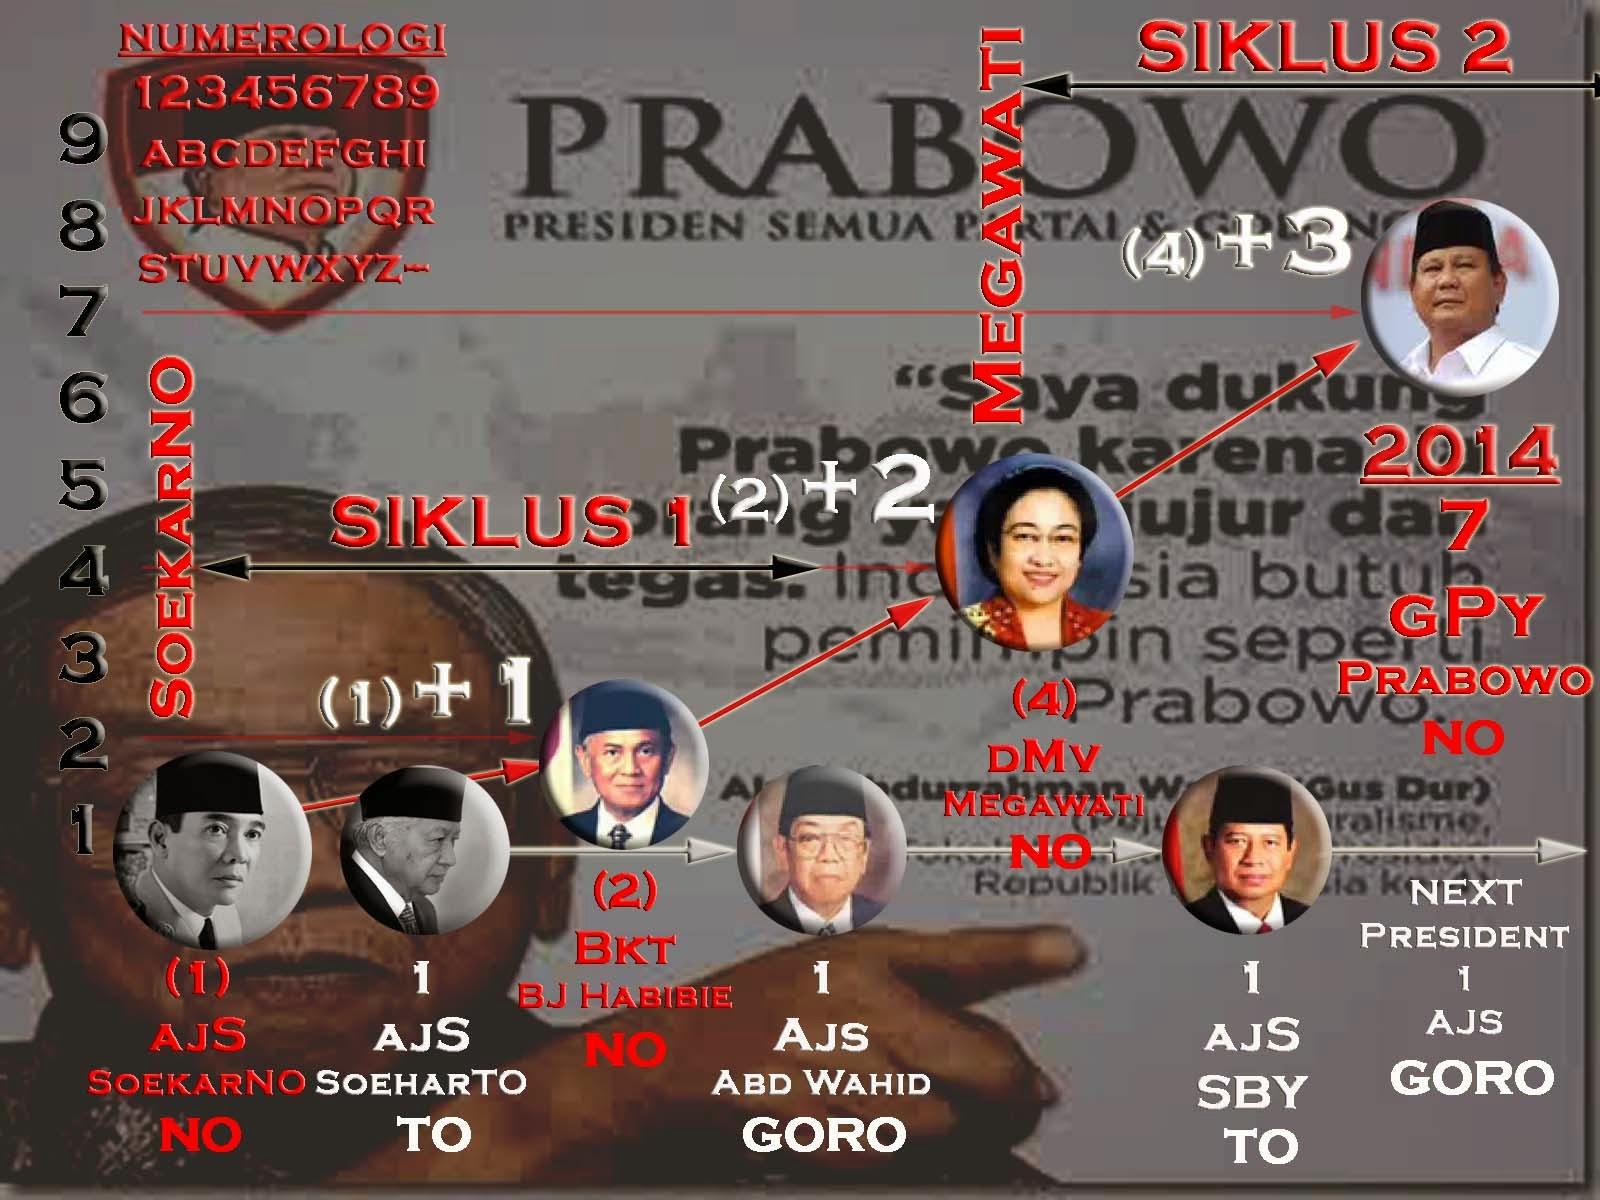 PRABOWO PRESIDEN INDONESIA KE 7 !